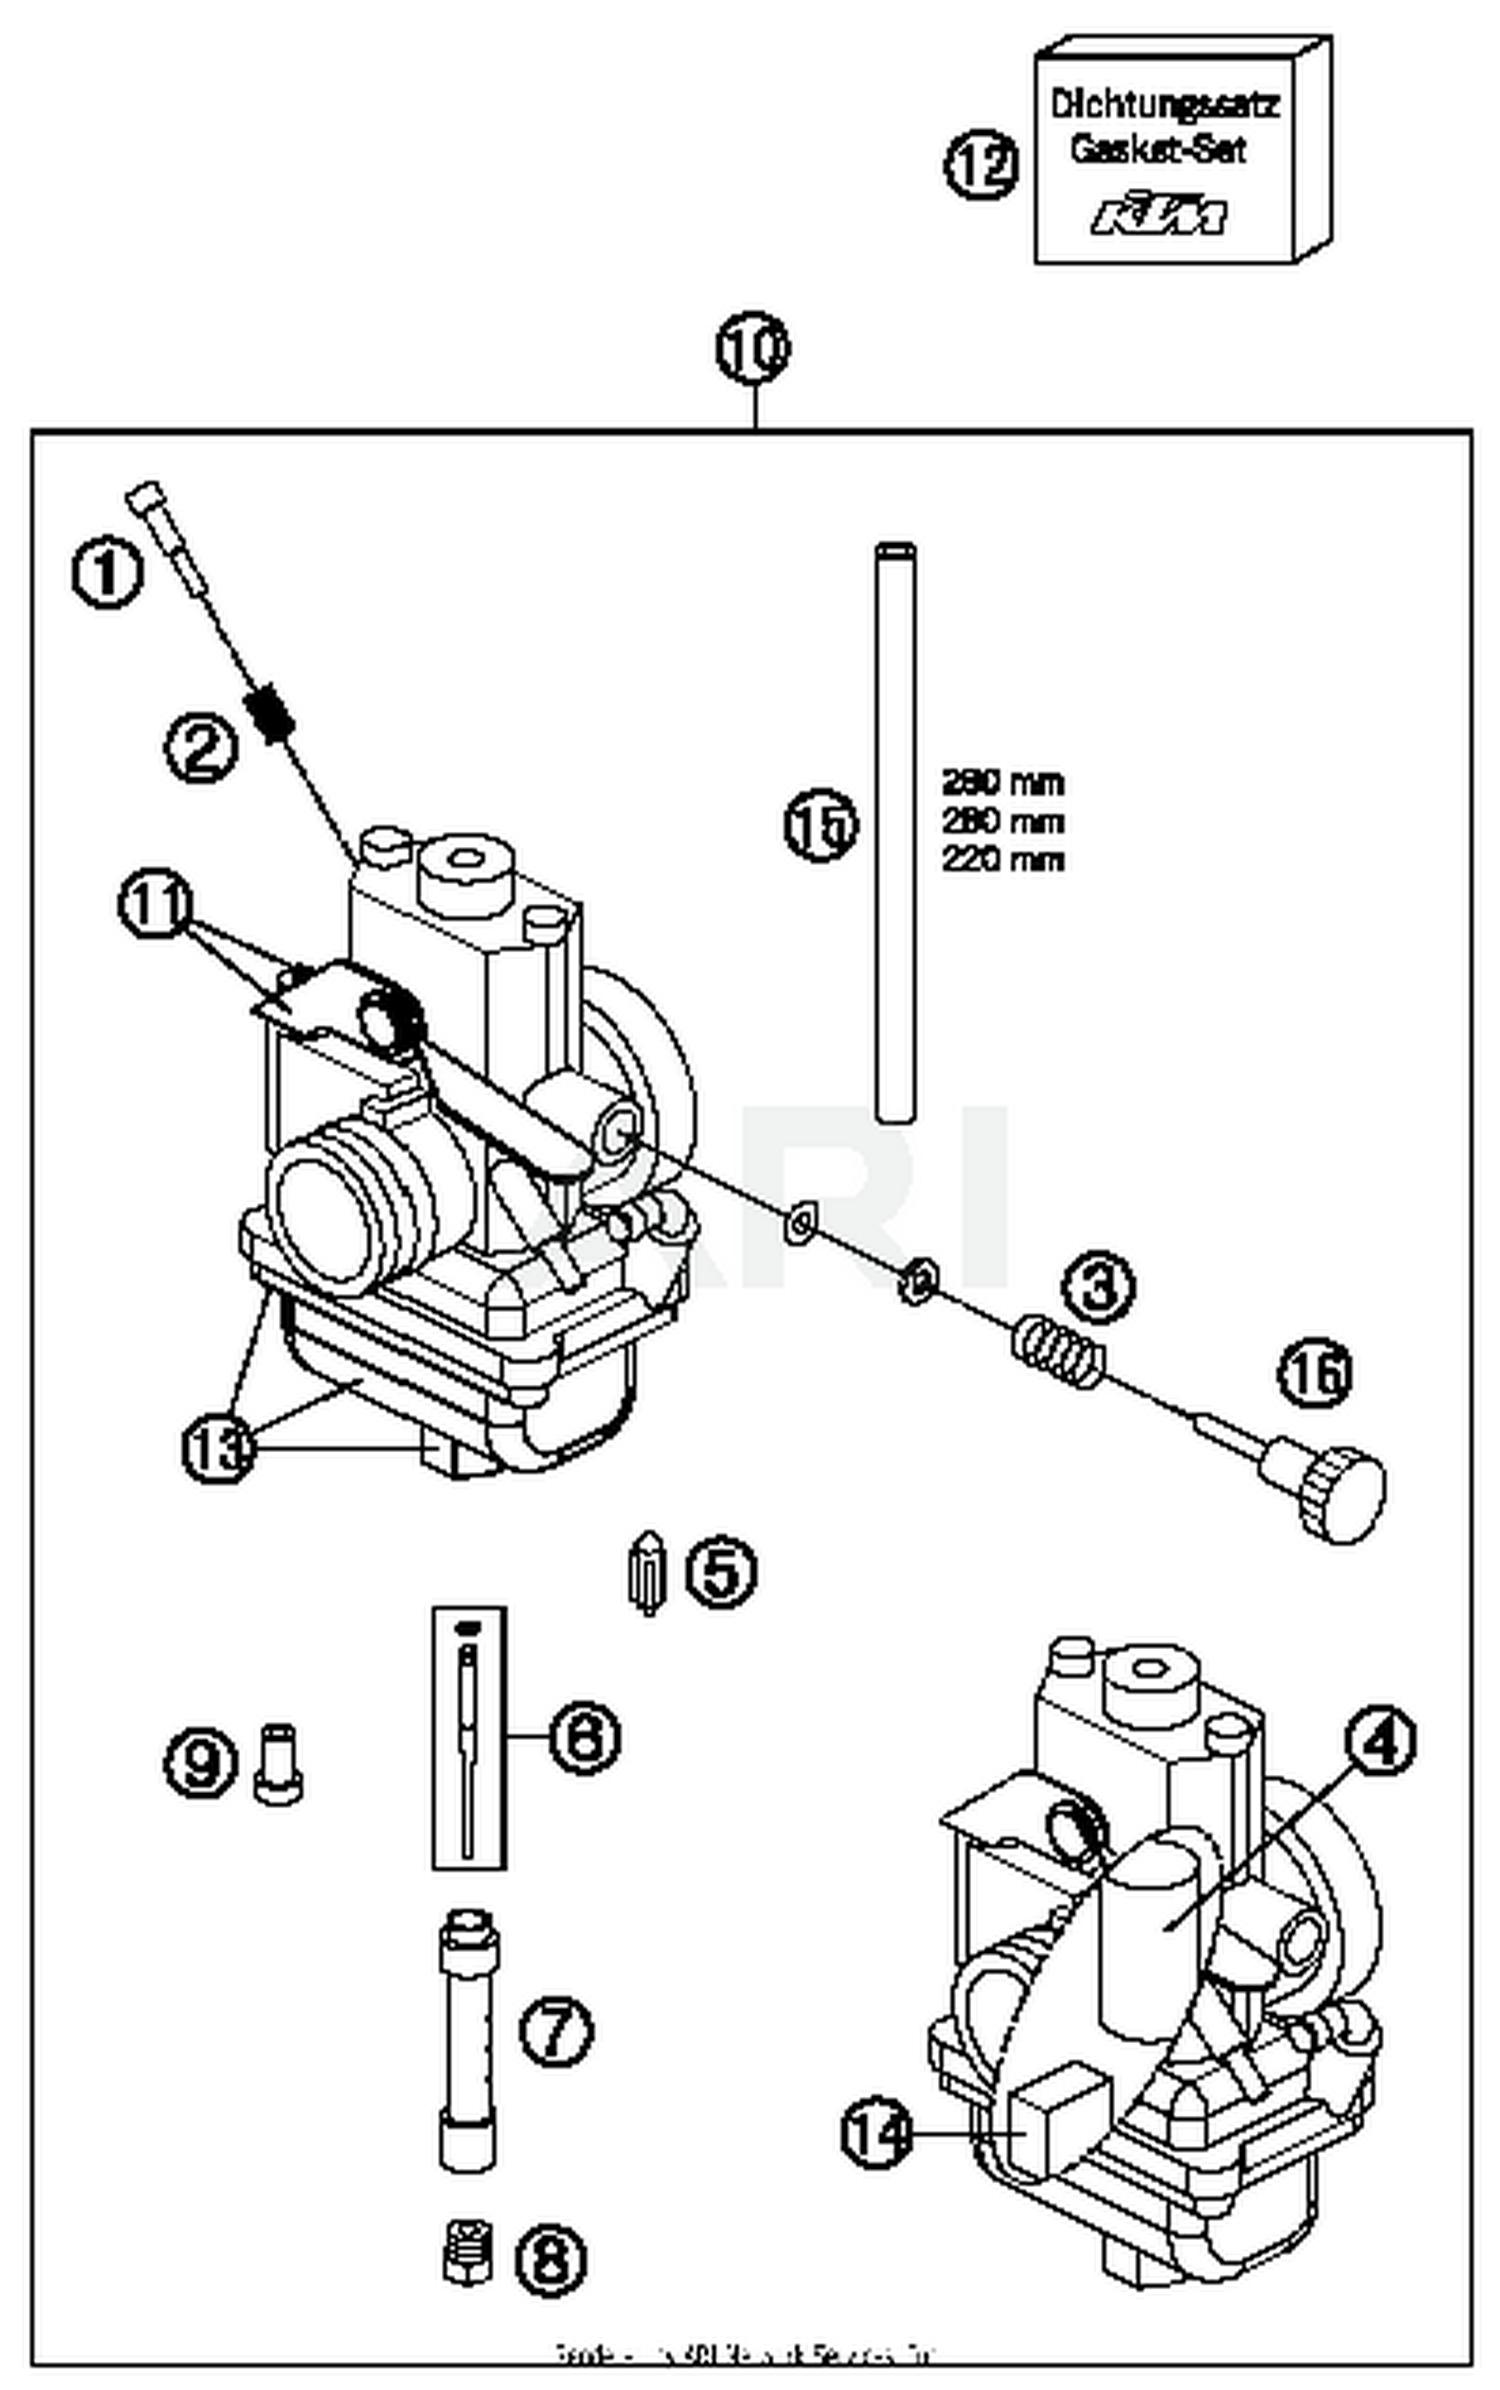 Ktm Carb Diagram Schematics Wiring Carburetor Drz 400 Upgrade Dirt Bike 2016 65 Sx Parts Best Oem Simple